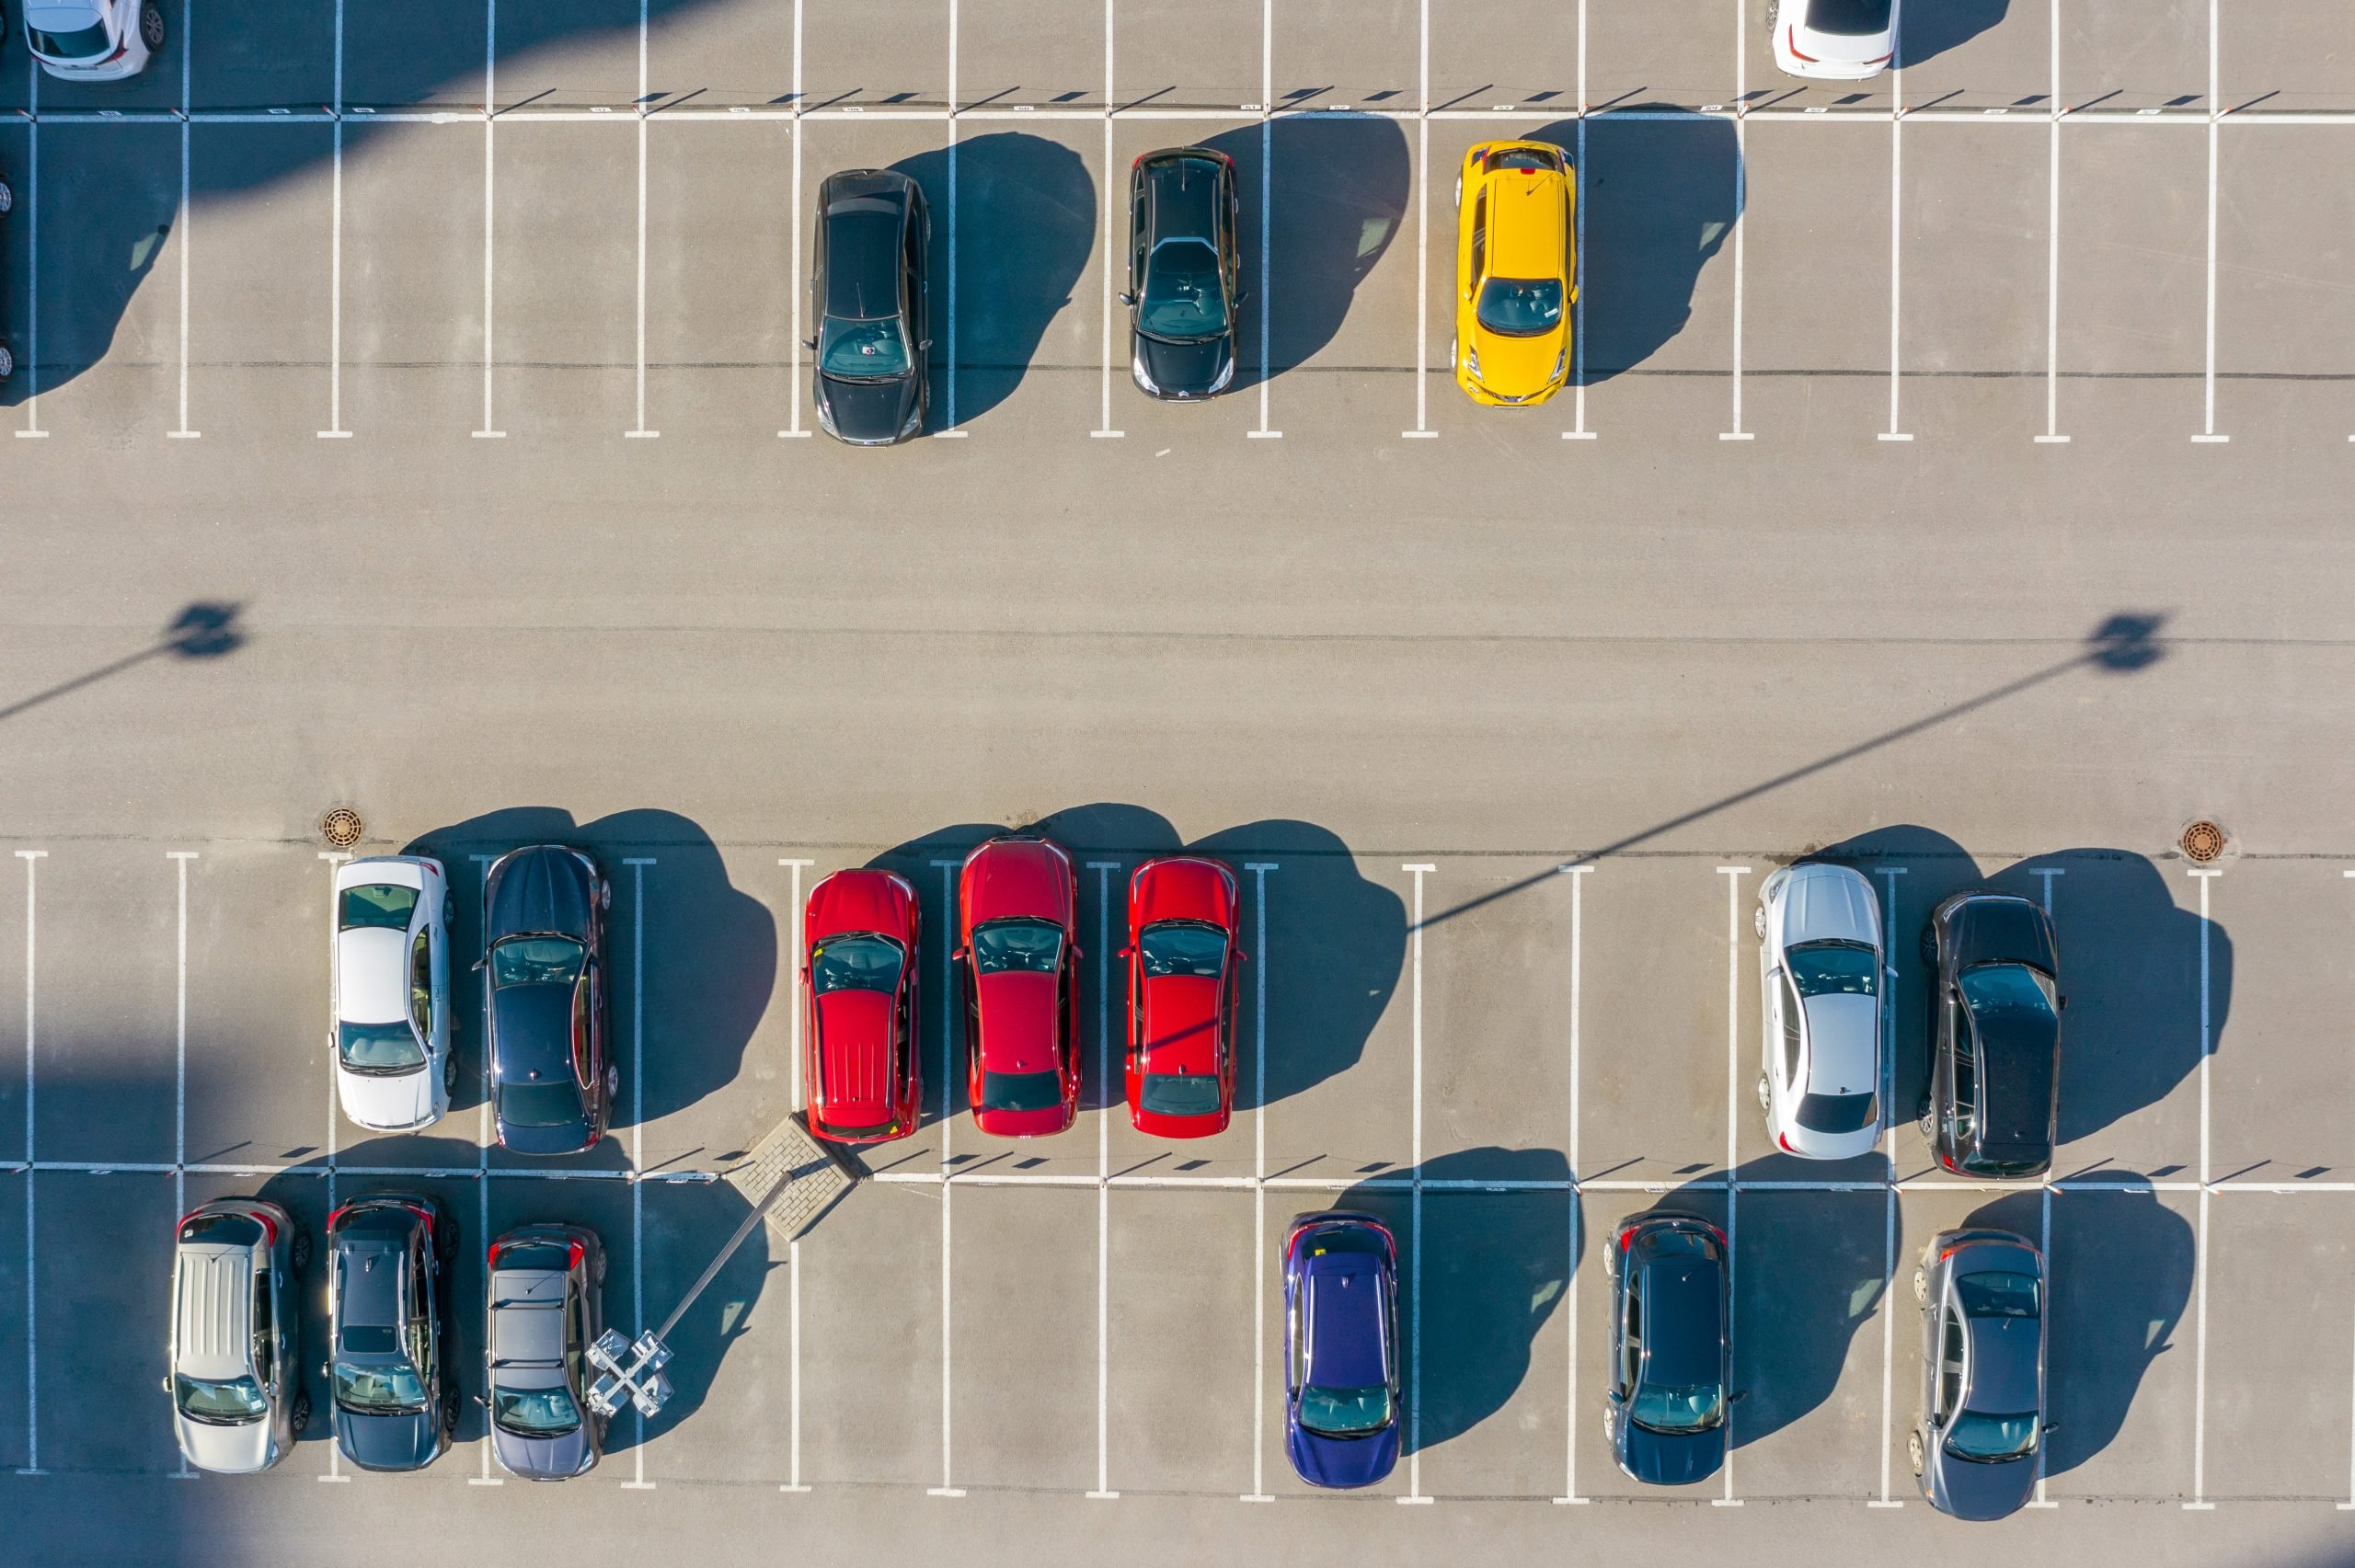 Employee Parking App